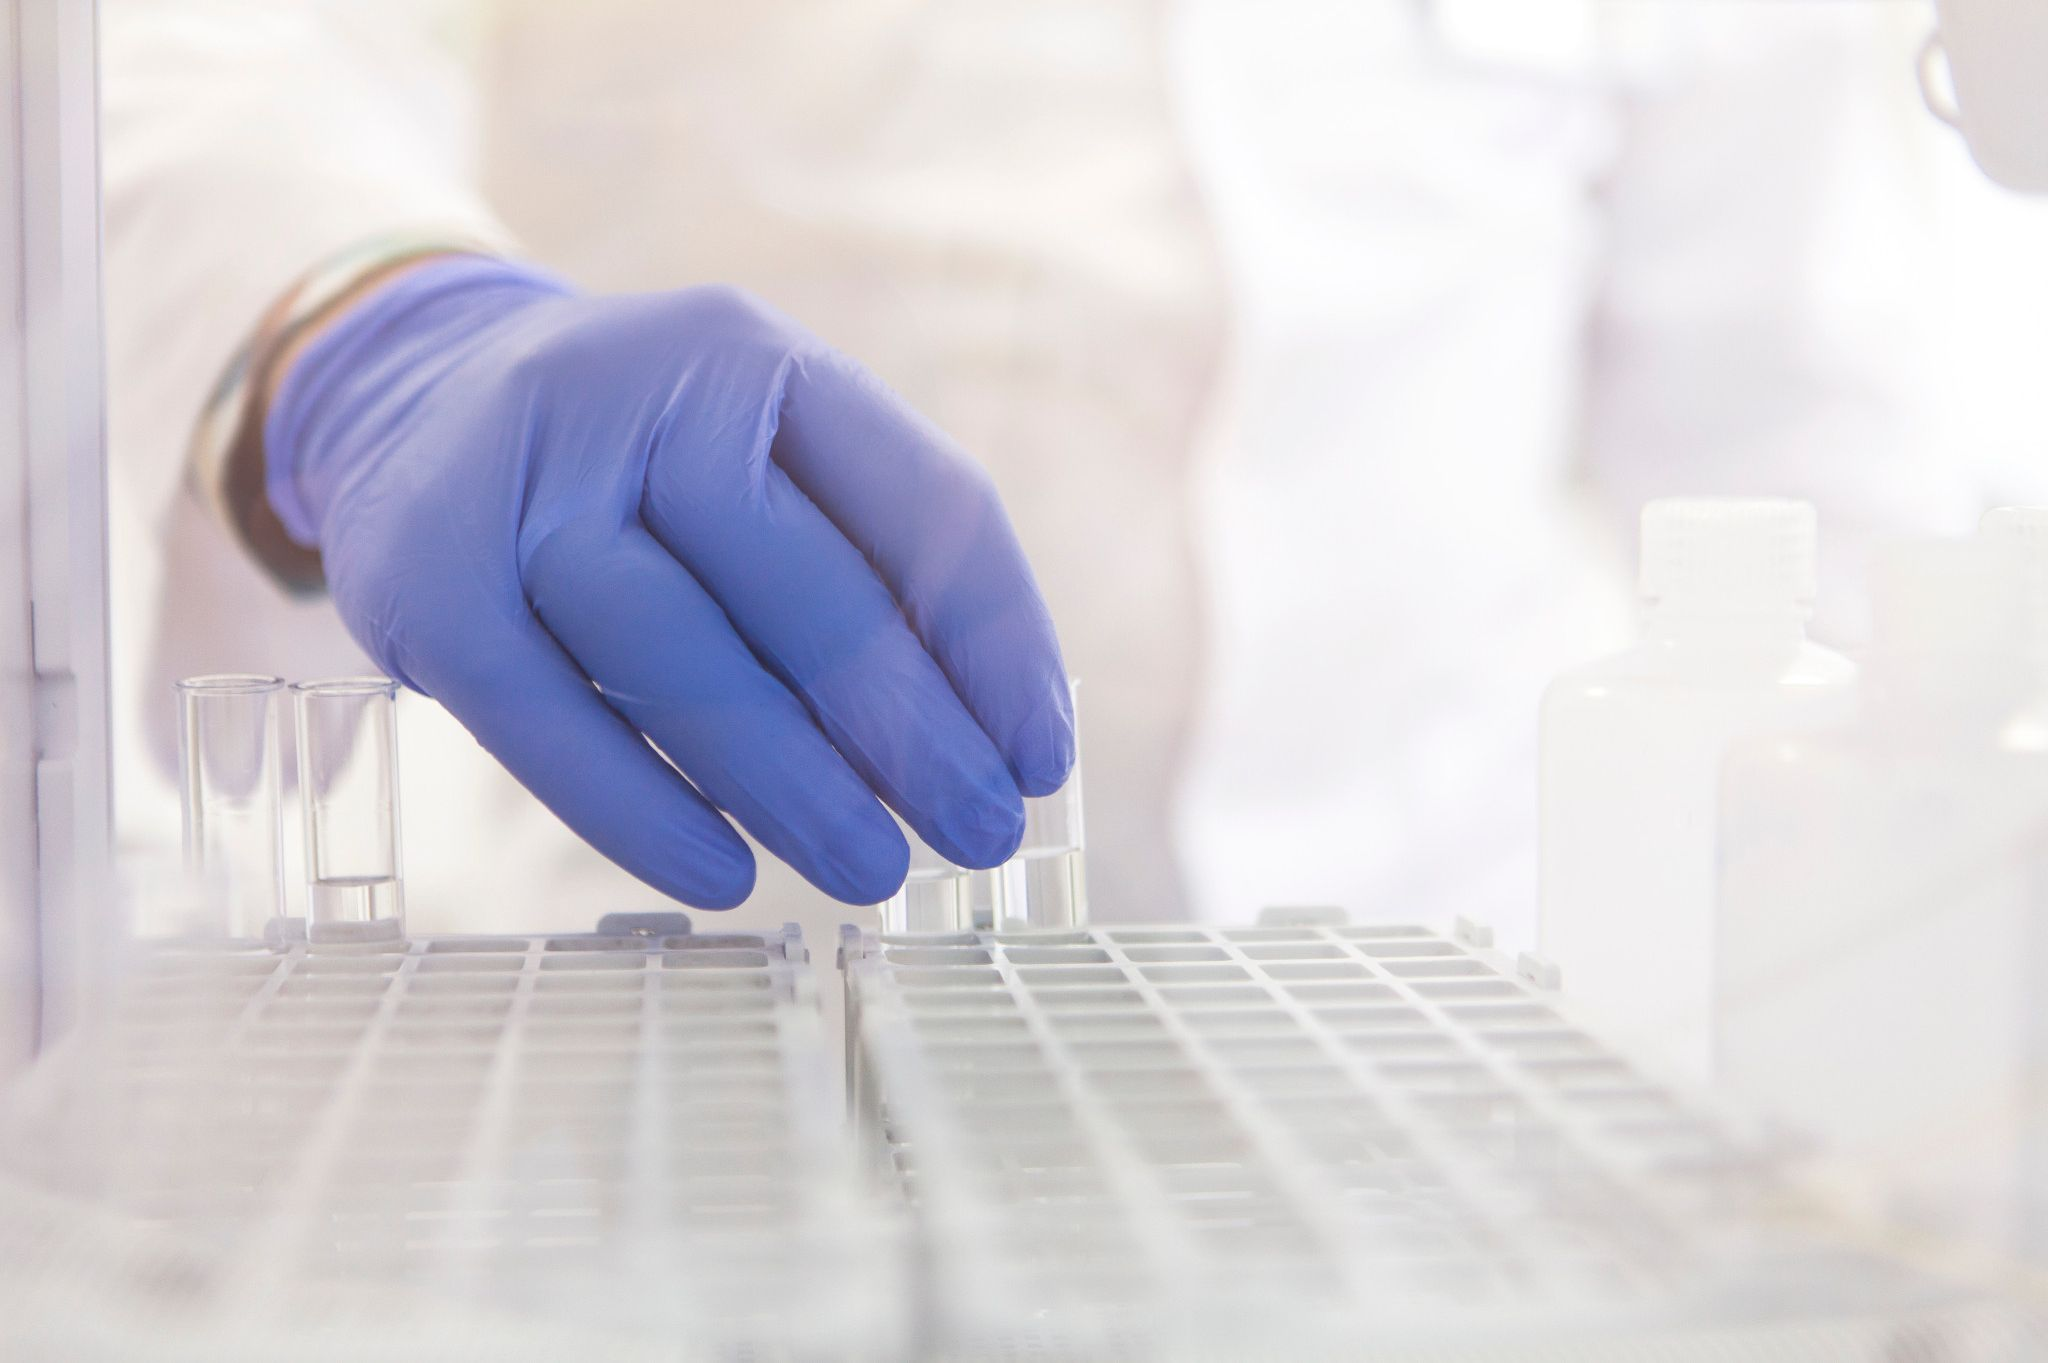 lab technician performing bioanalysis